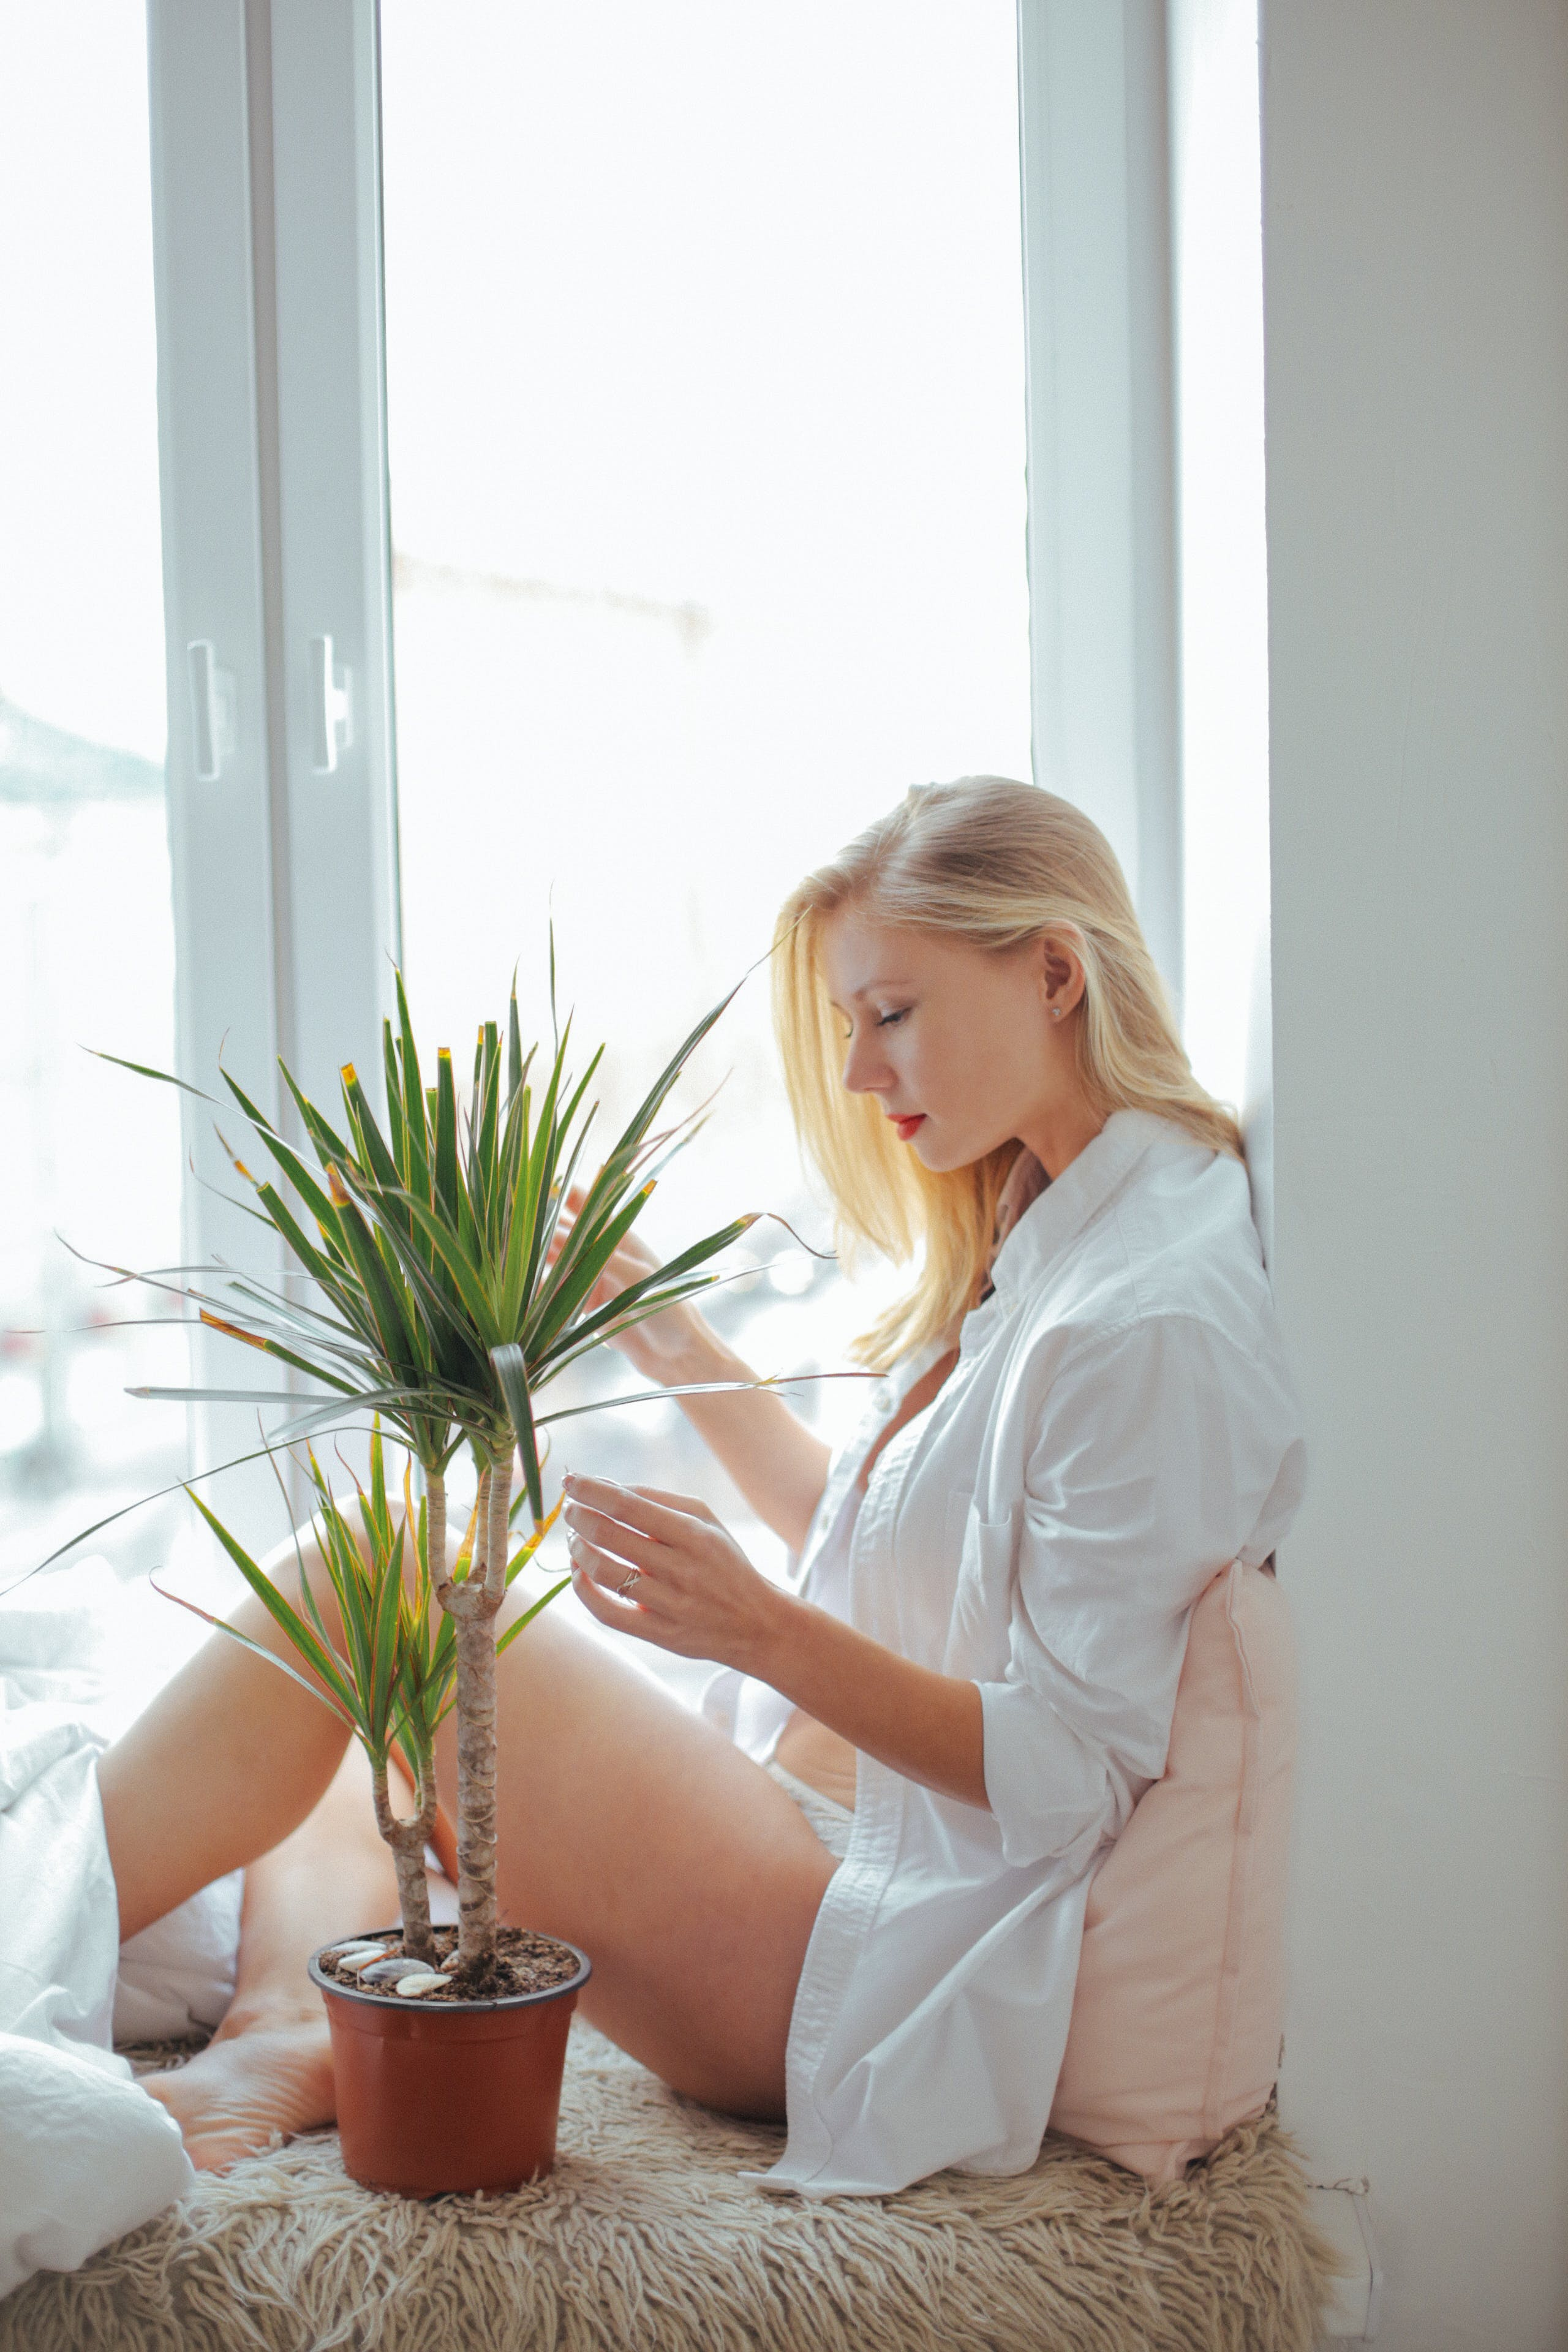 Woman Wearing White Long-sleeved Shirt Sitting Beside Green Plant